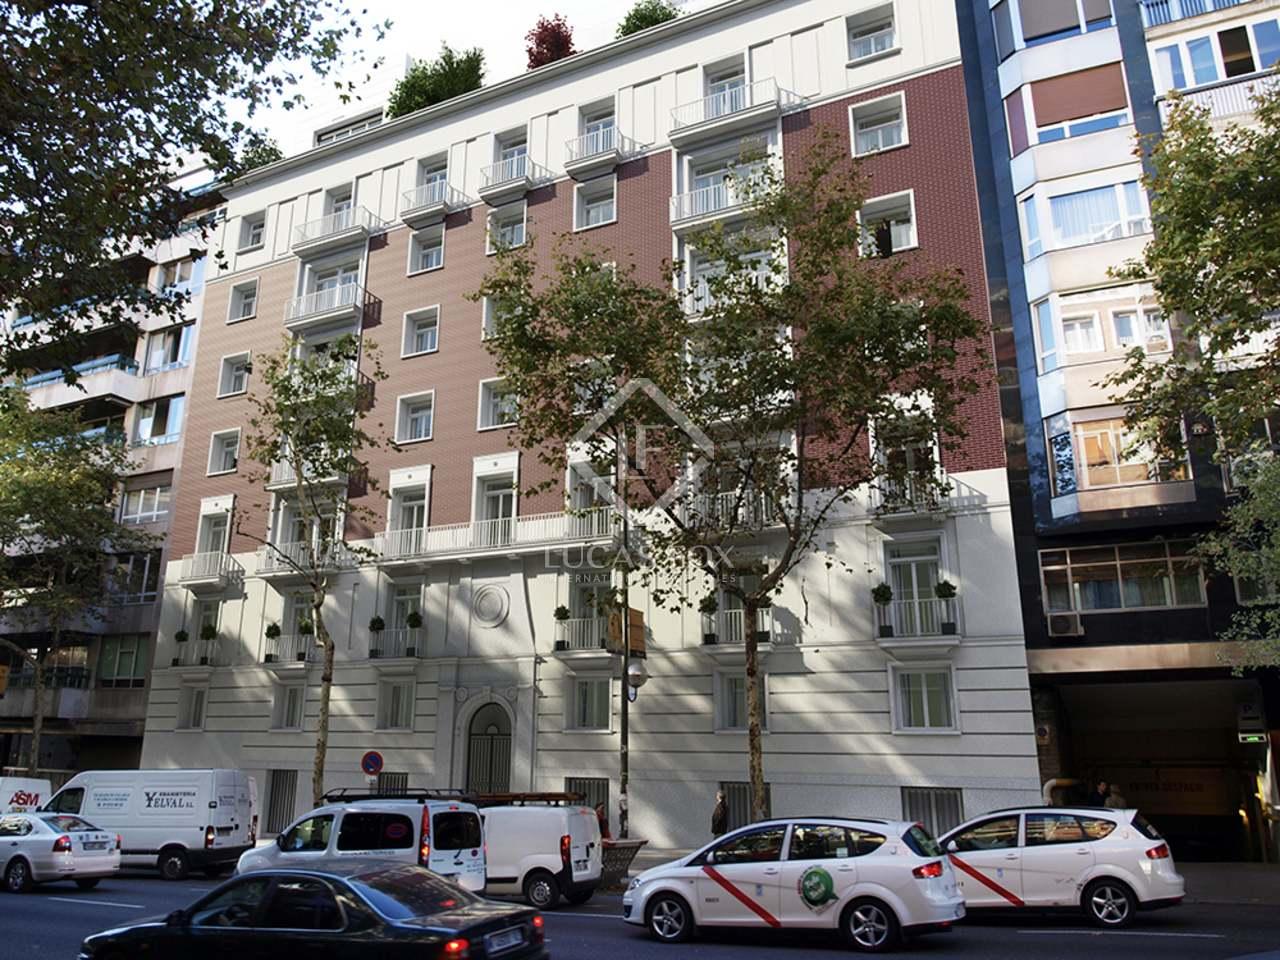 Tico nuevo de 3 dormitorios con terraza madrid - Zona chamberi madrid ...